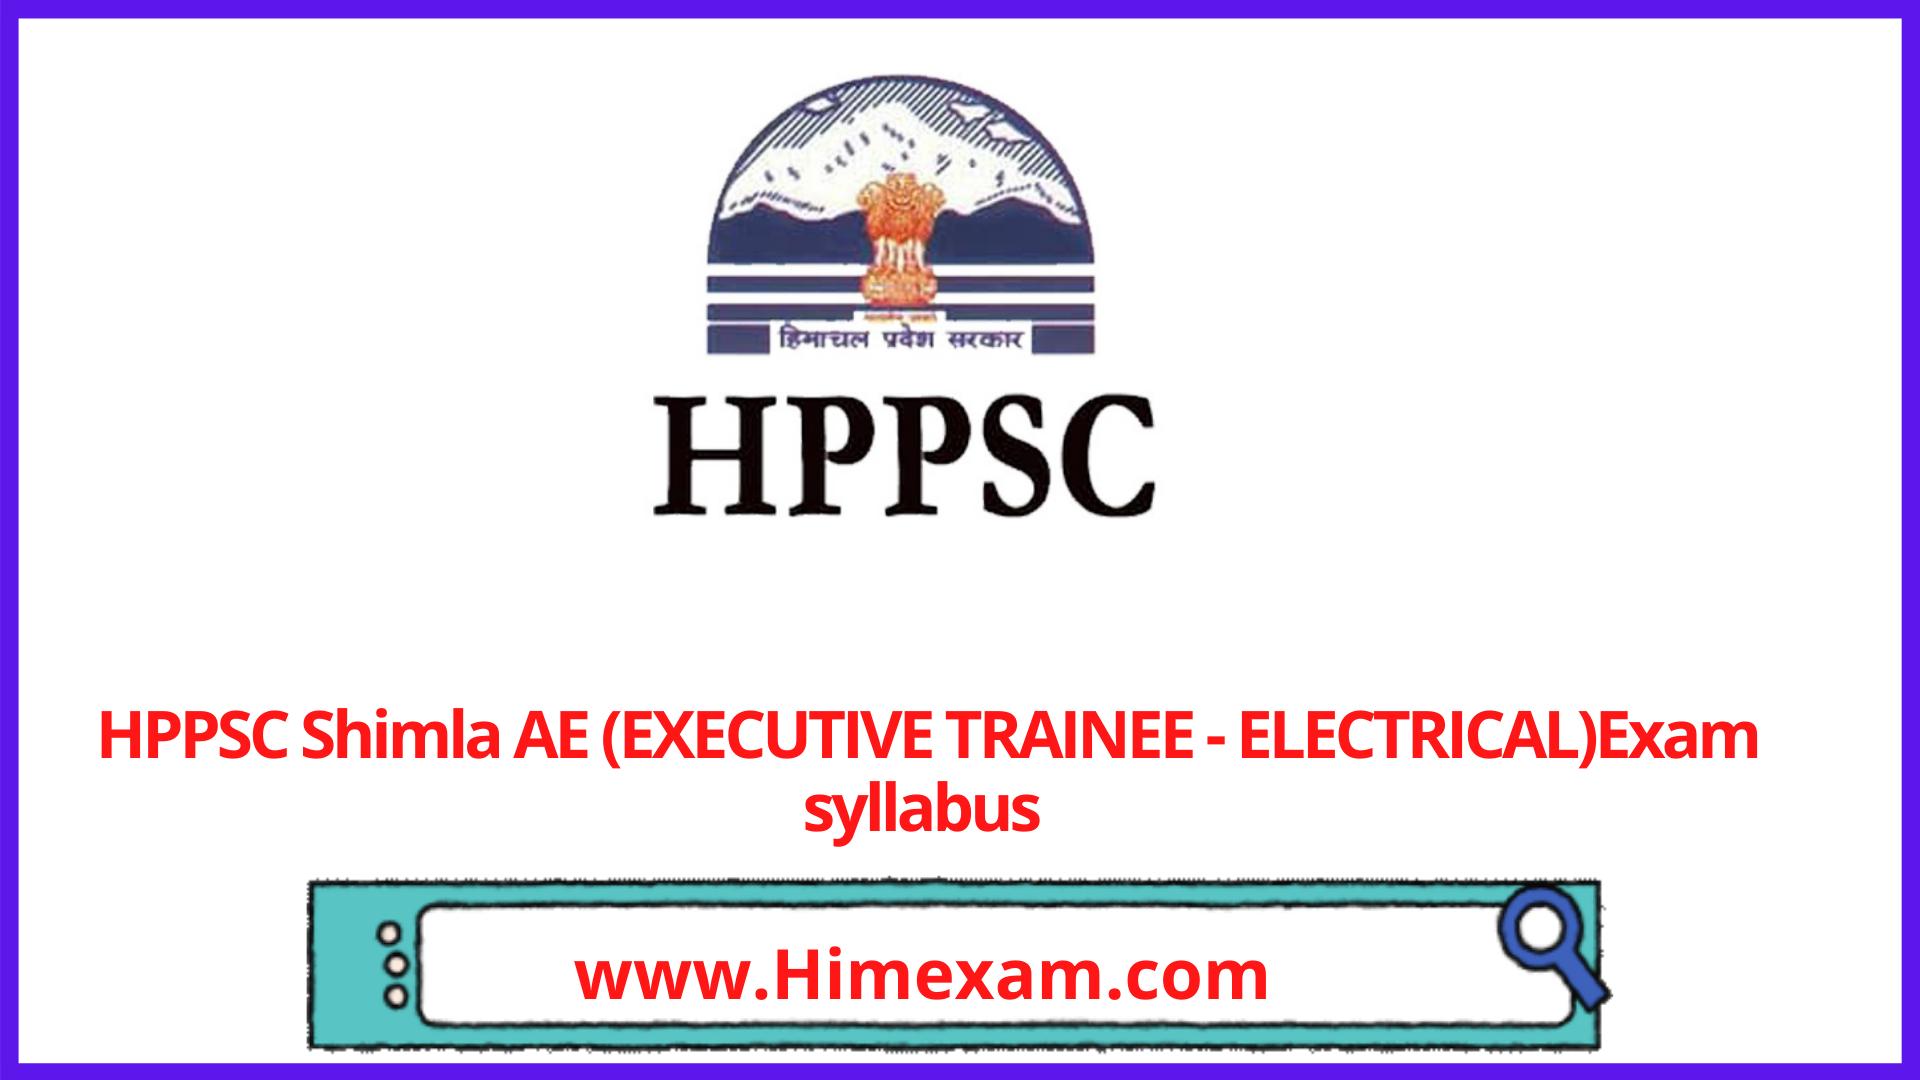 HPPSC Shimla AE (EXECUTIVE TRAINEE - ELECTRICAL)Exam syllabus